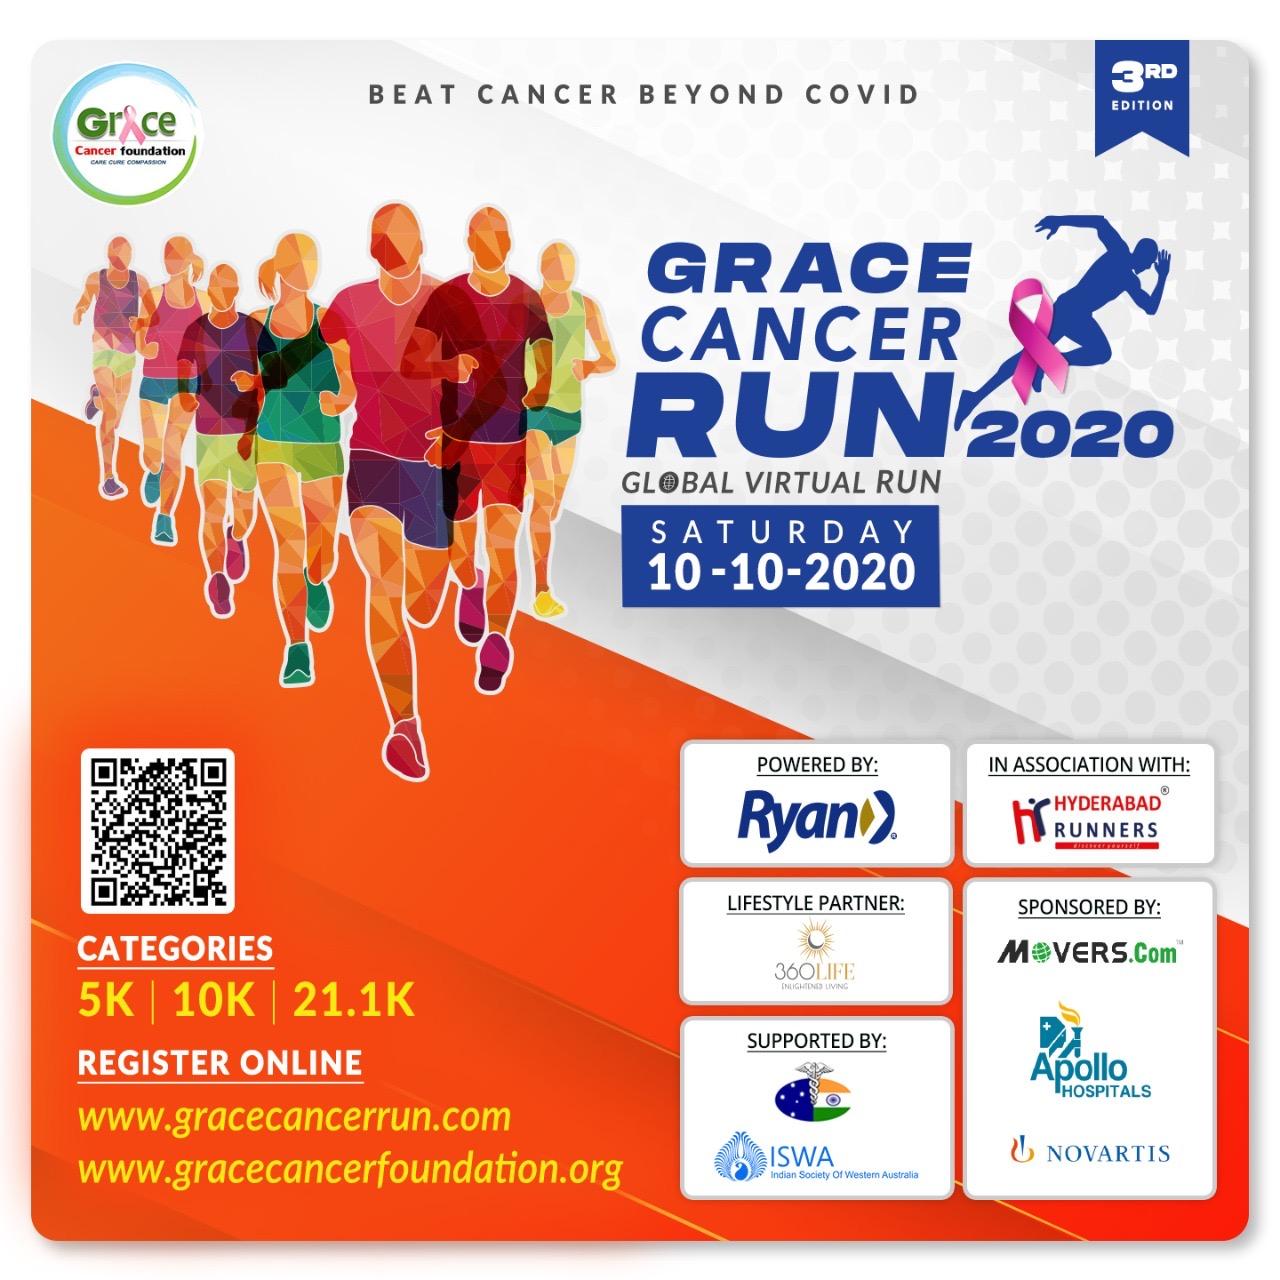 Grace Global Cancer Virtual Run on 10-10-2020